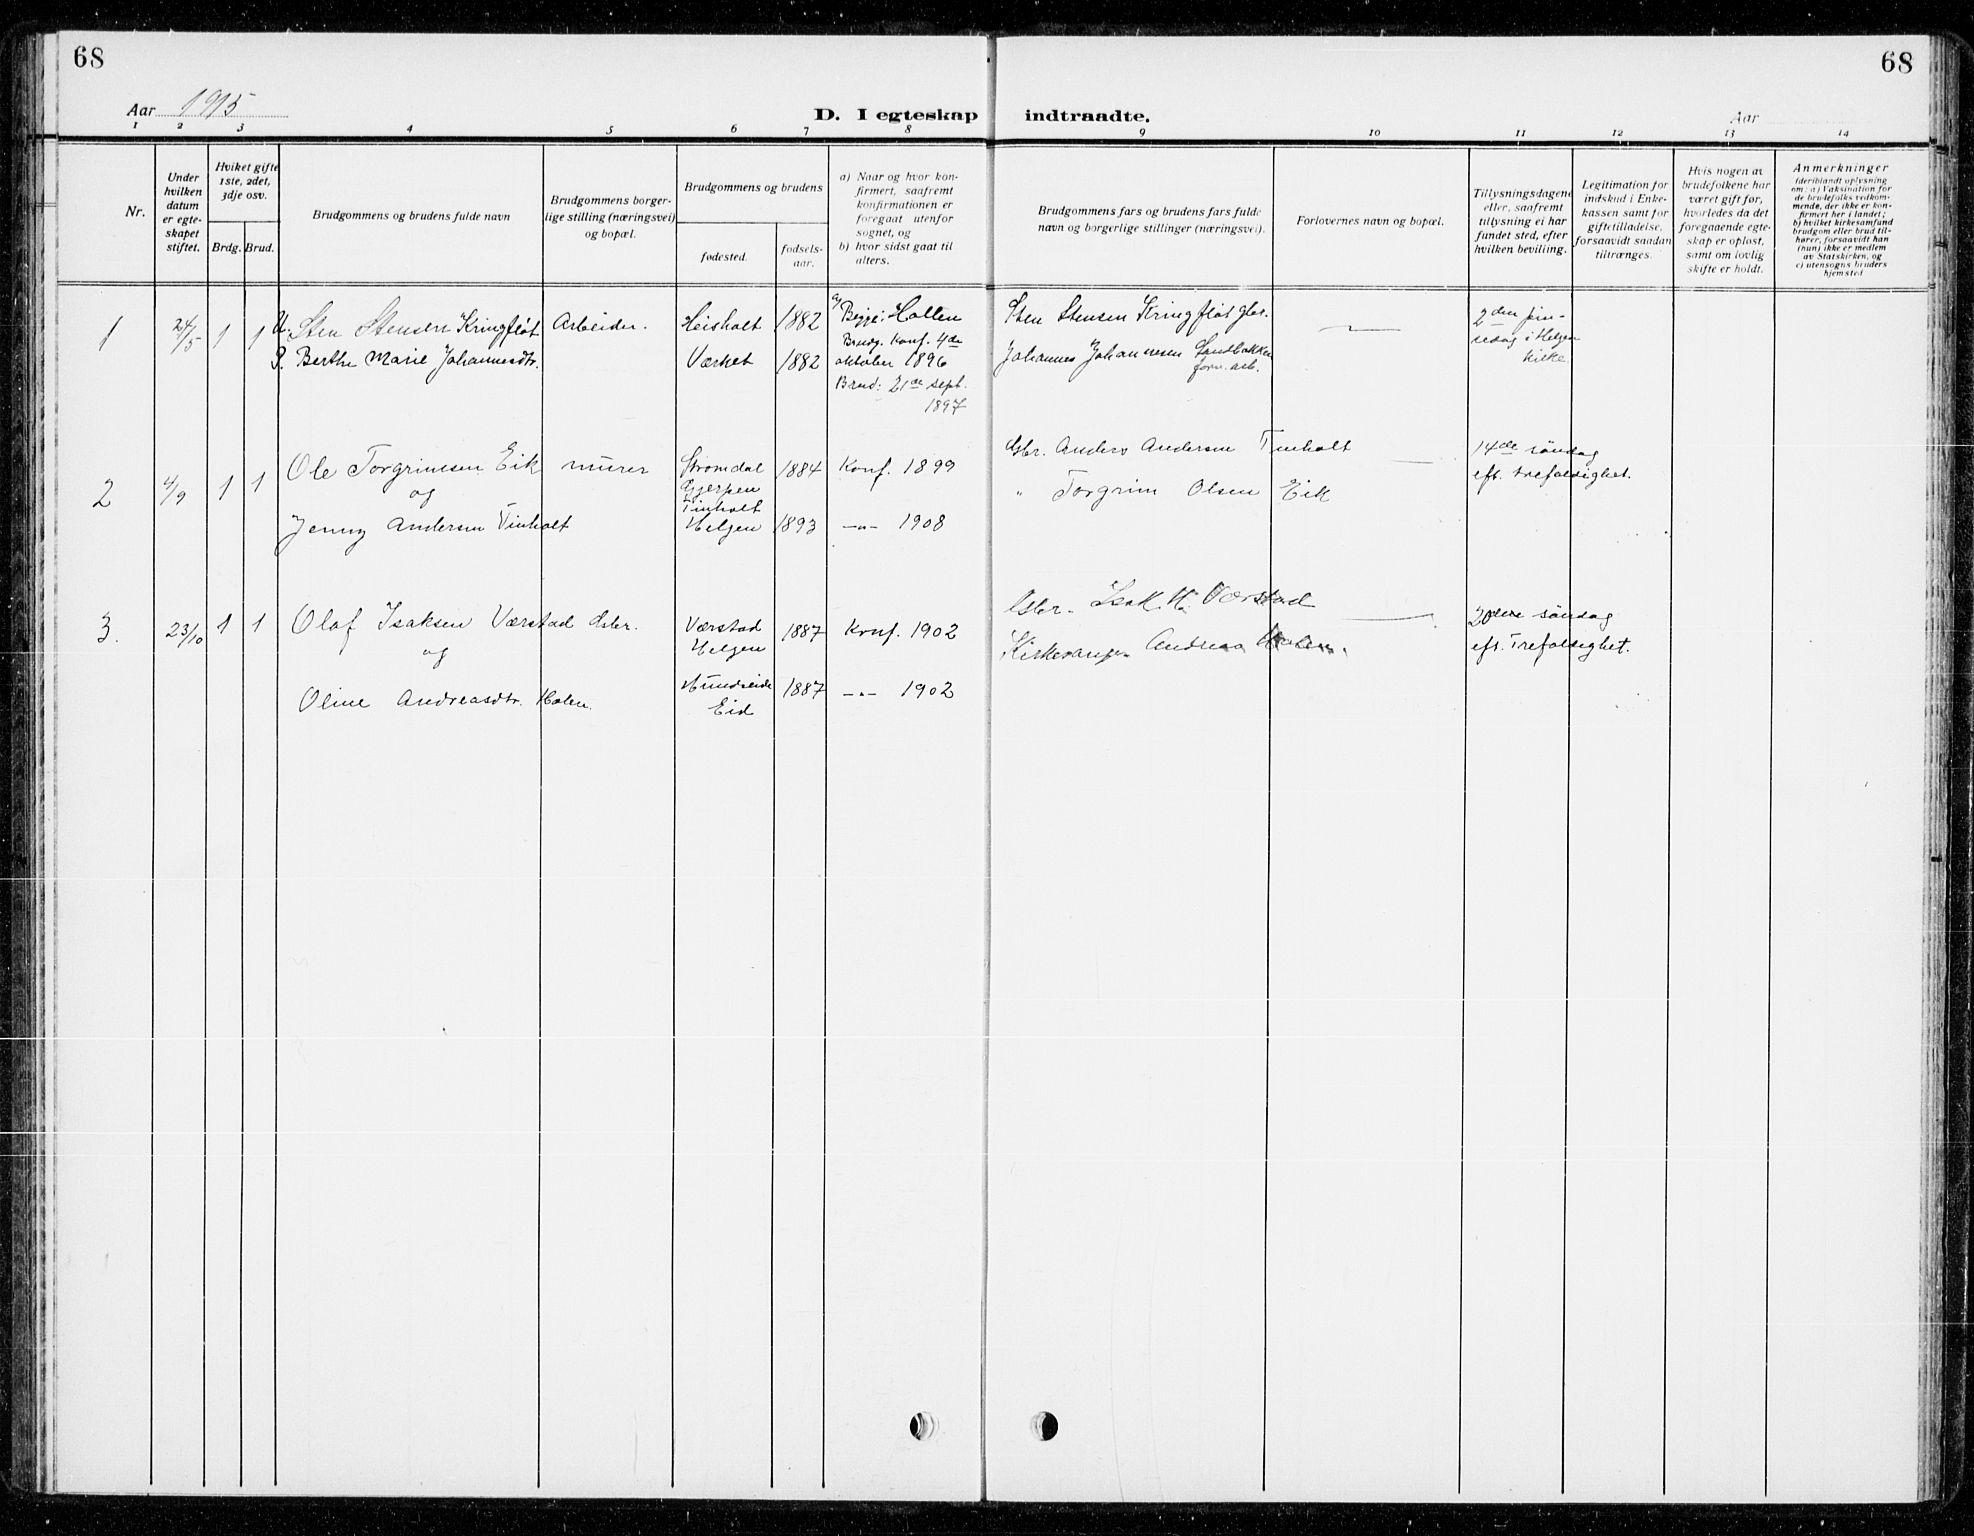 SAKO, Holla kirkebøker, G/Gb/L0003: Klokkerbok nr. II 3, 1914-1941, s. 68